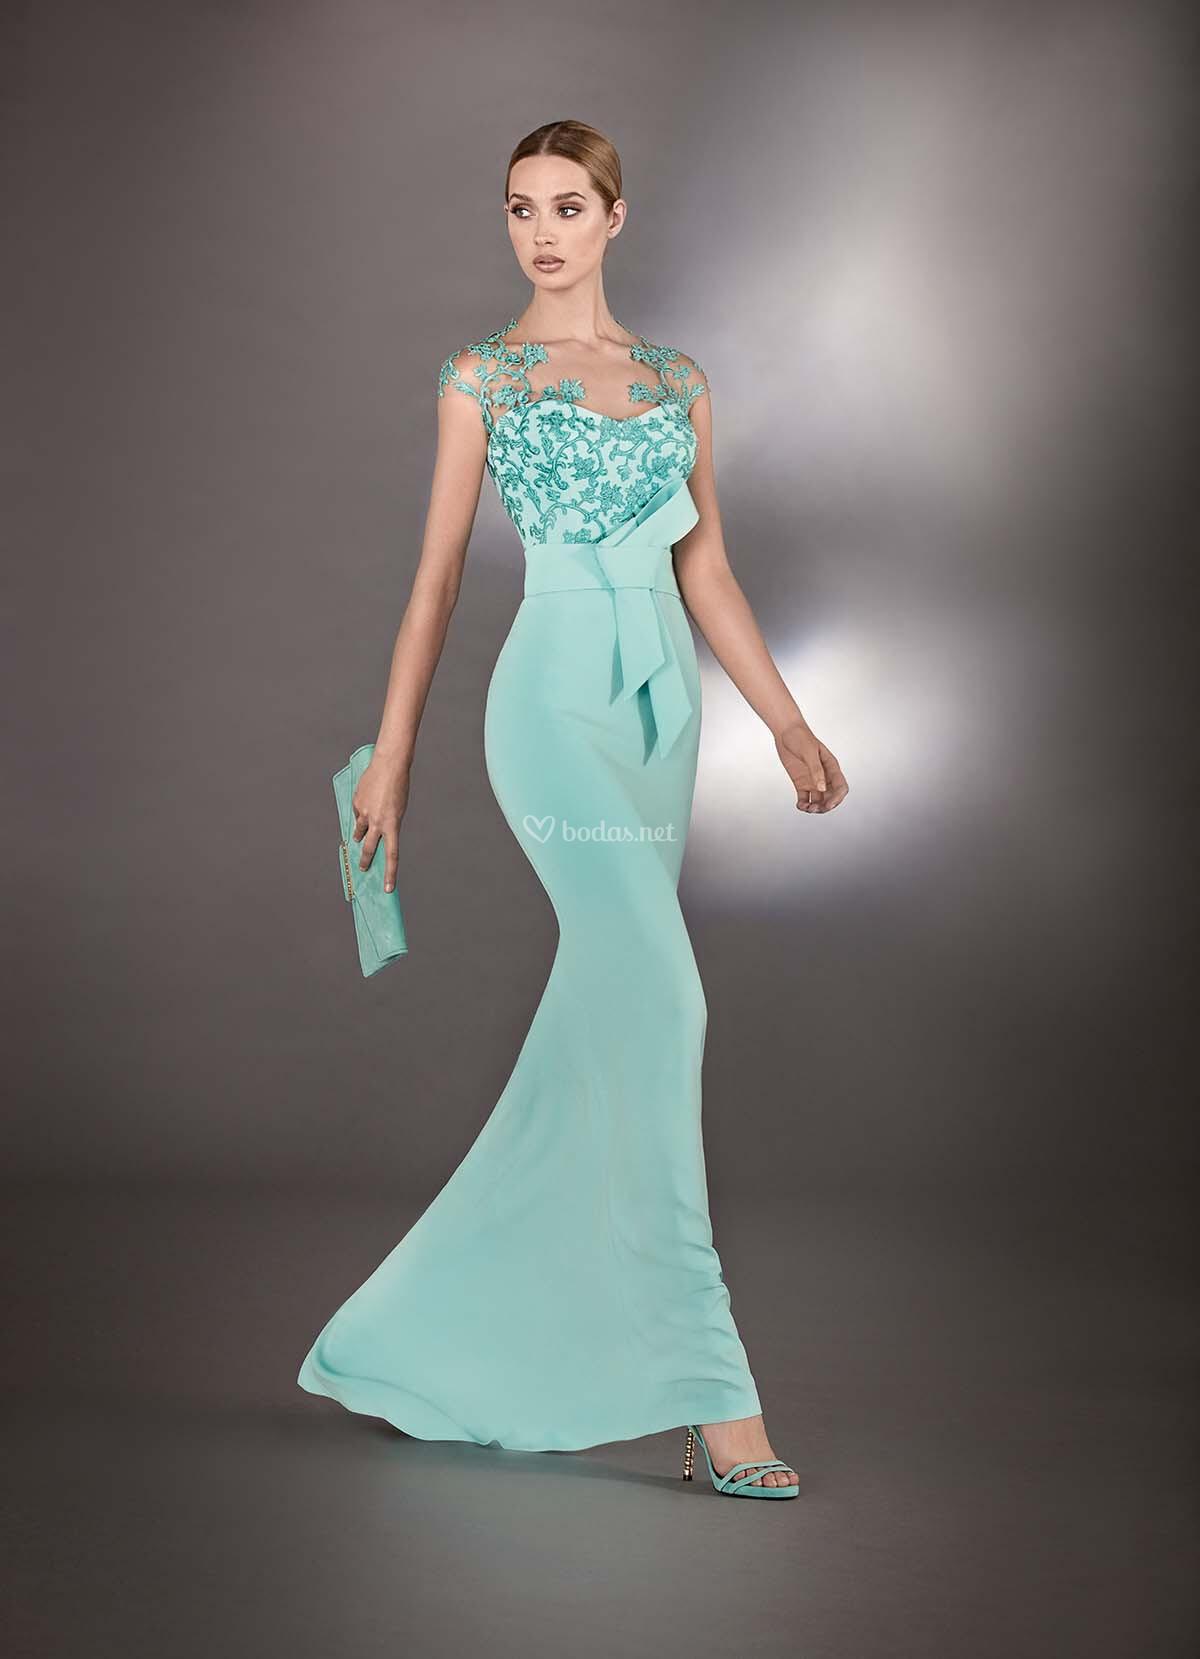 Vestidos de Madrina de Hannibal Laguna Atelier - 2017 - Bodas.net